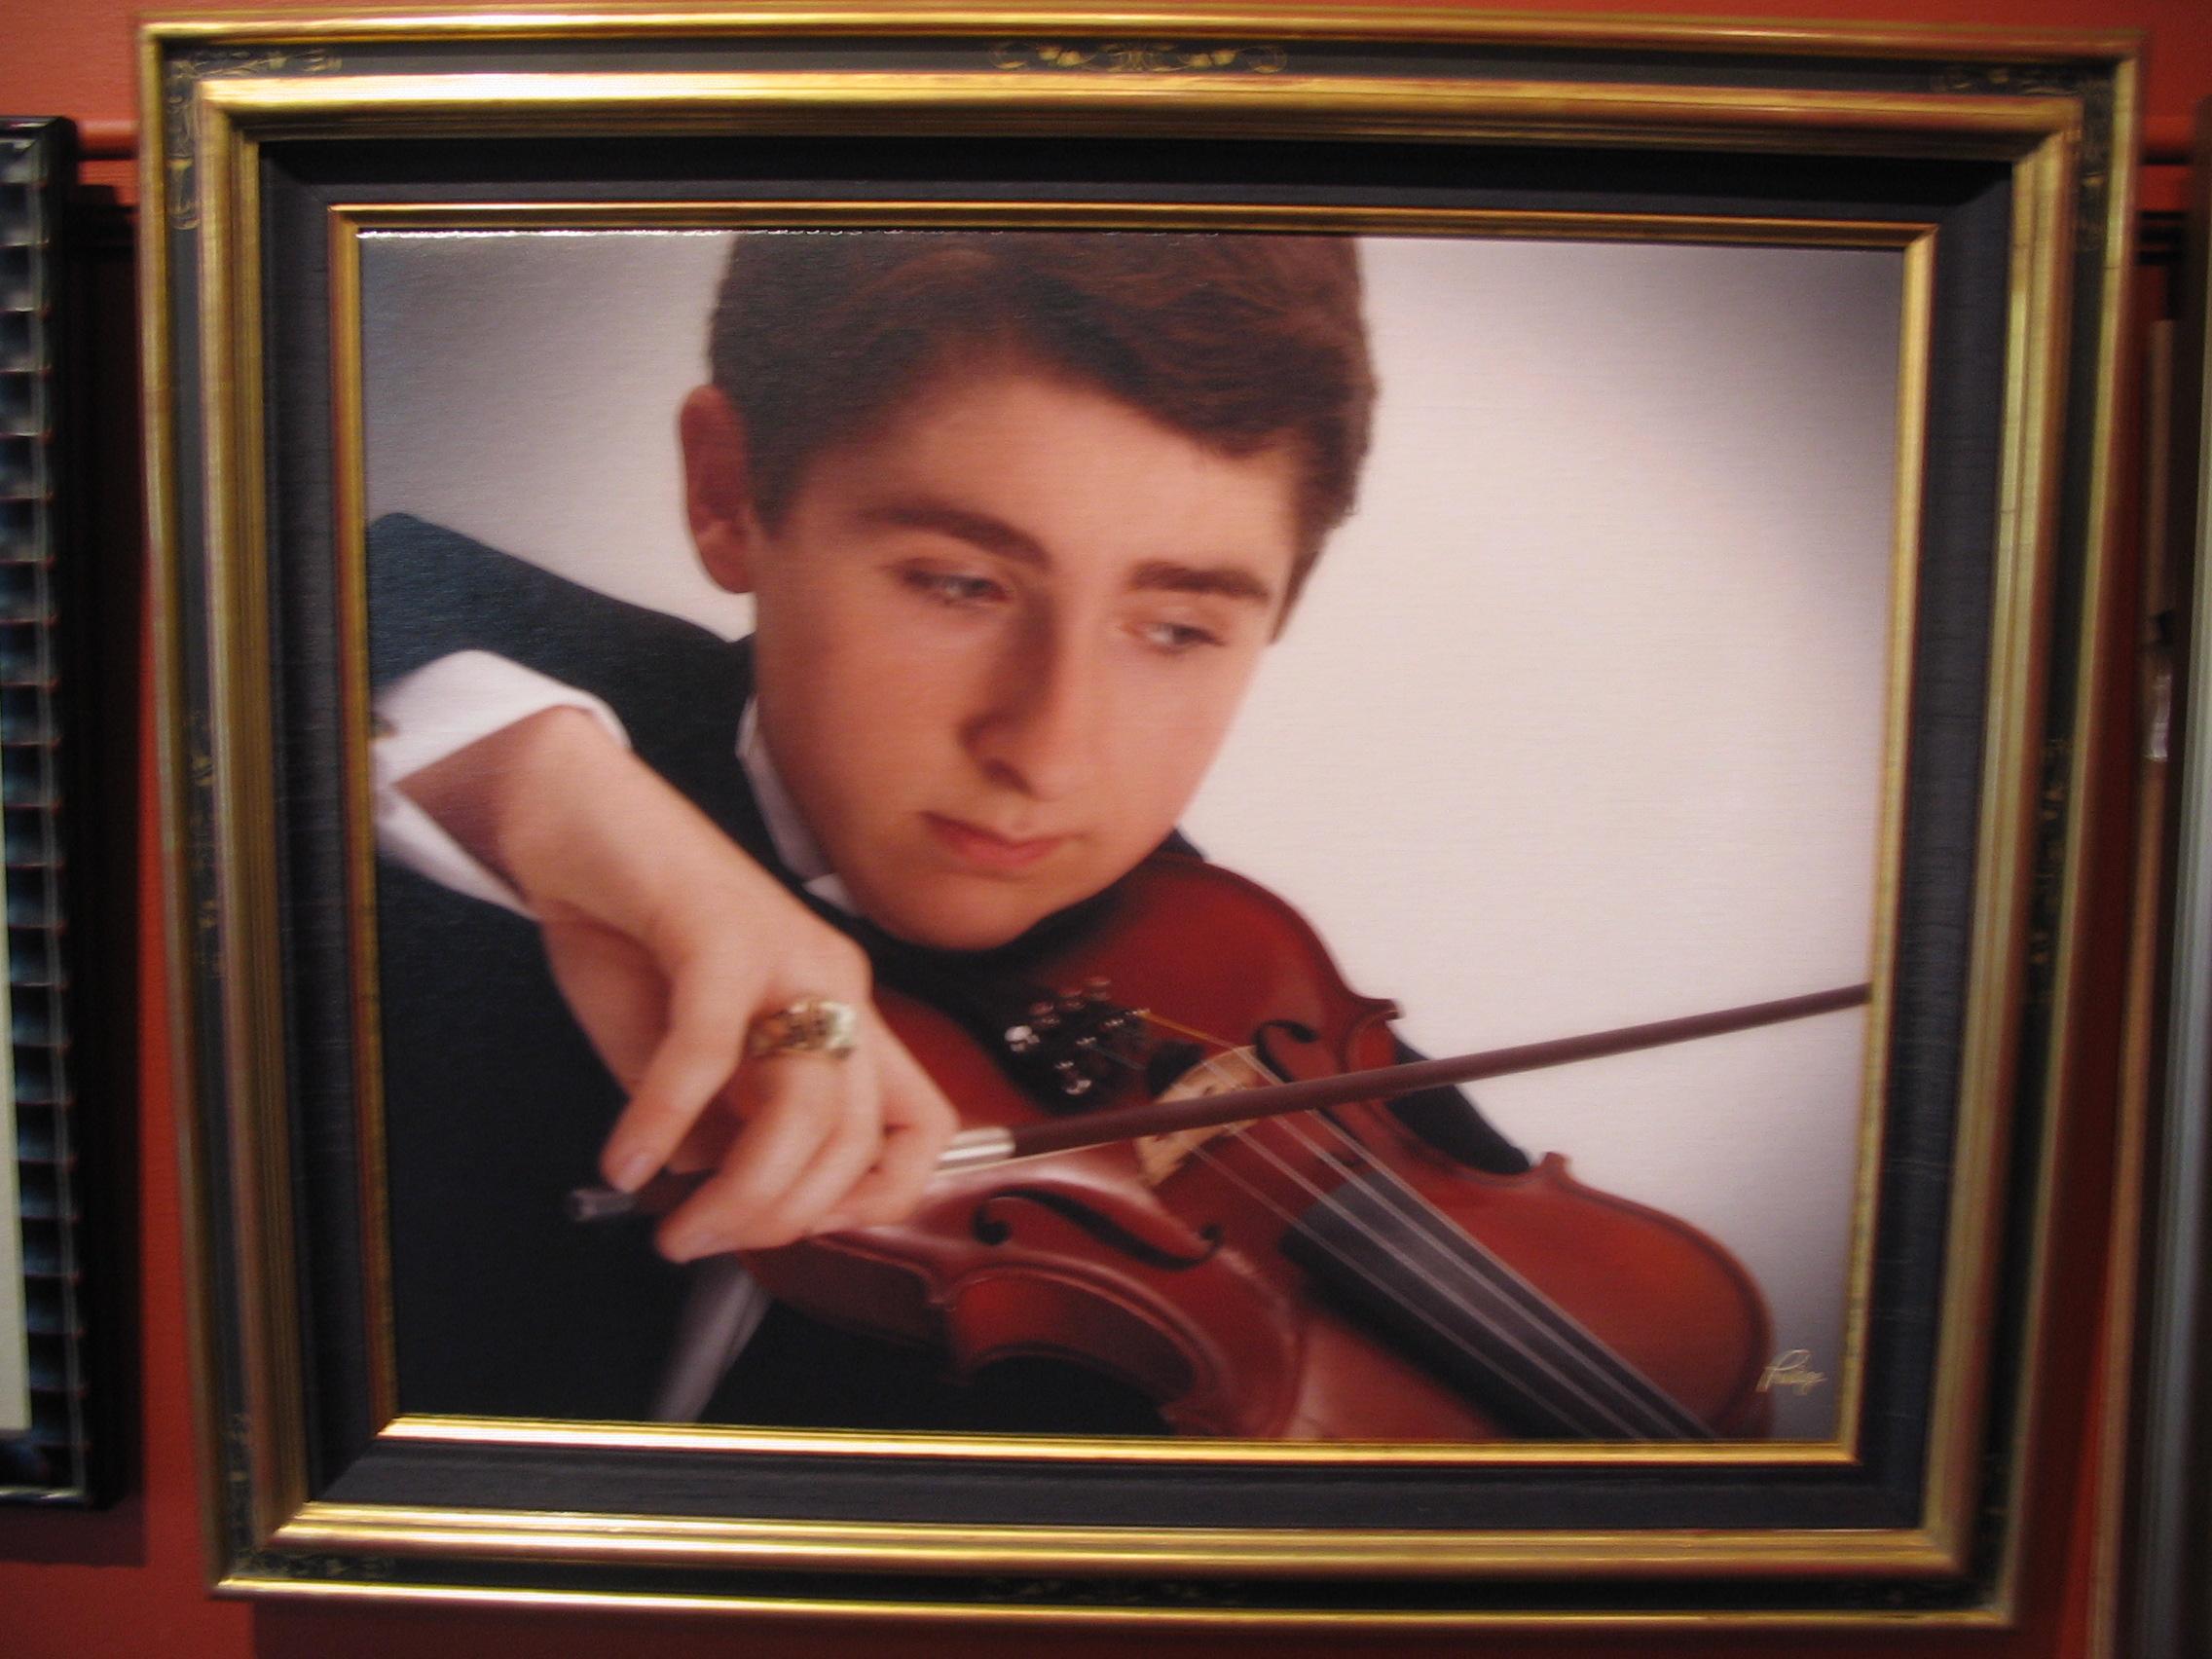 Violin framed by The Framemakers